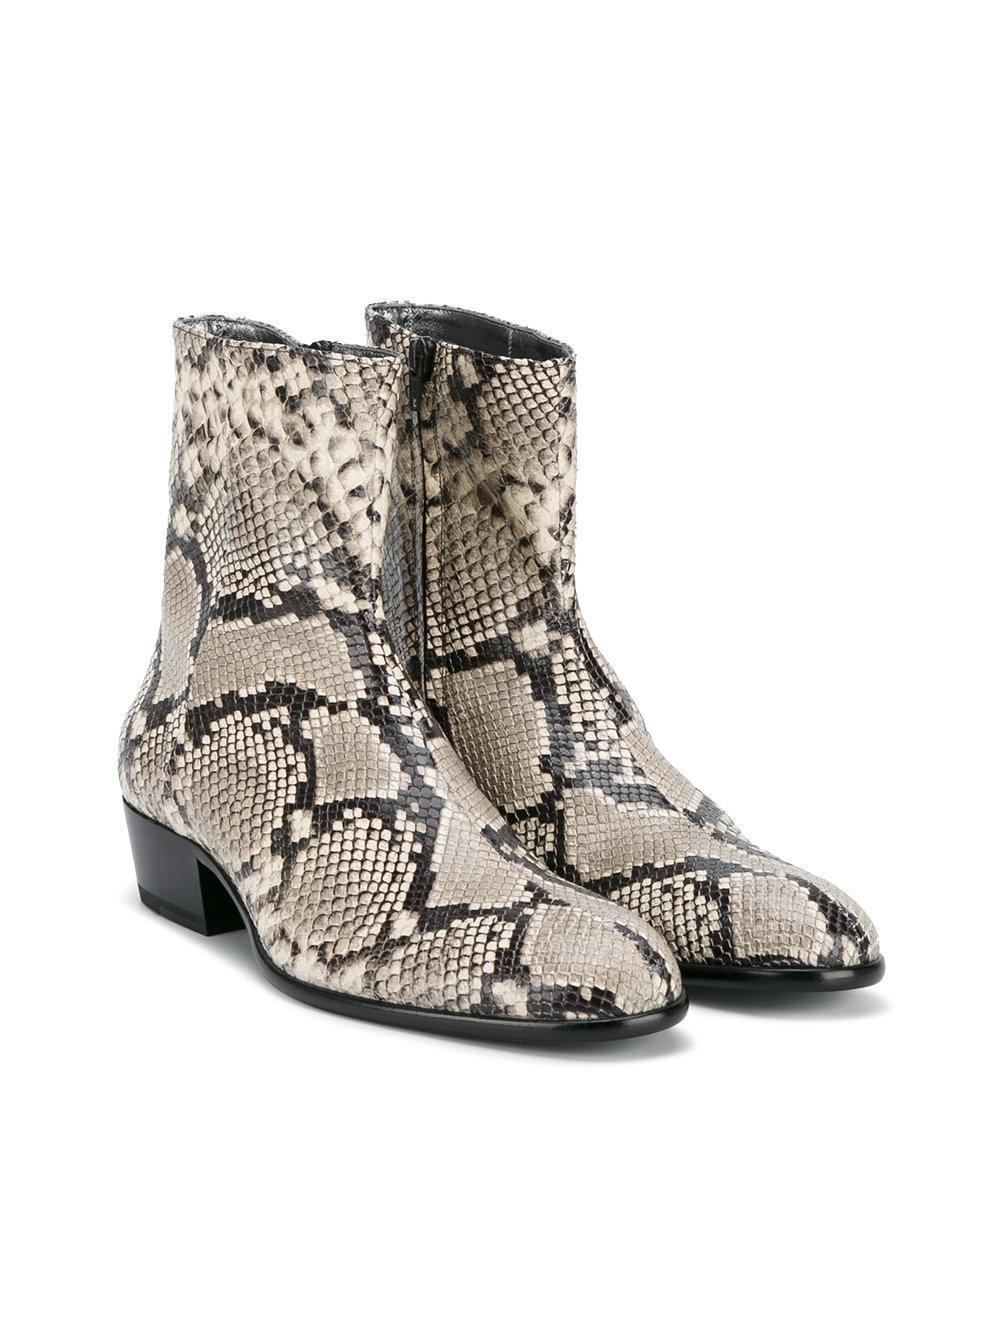 Snake Print Shoes Men